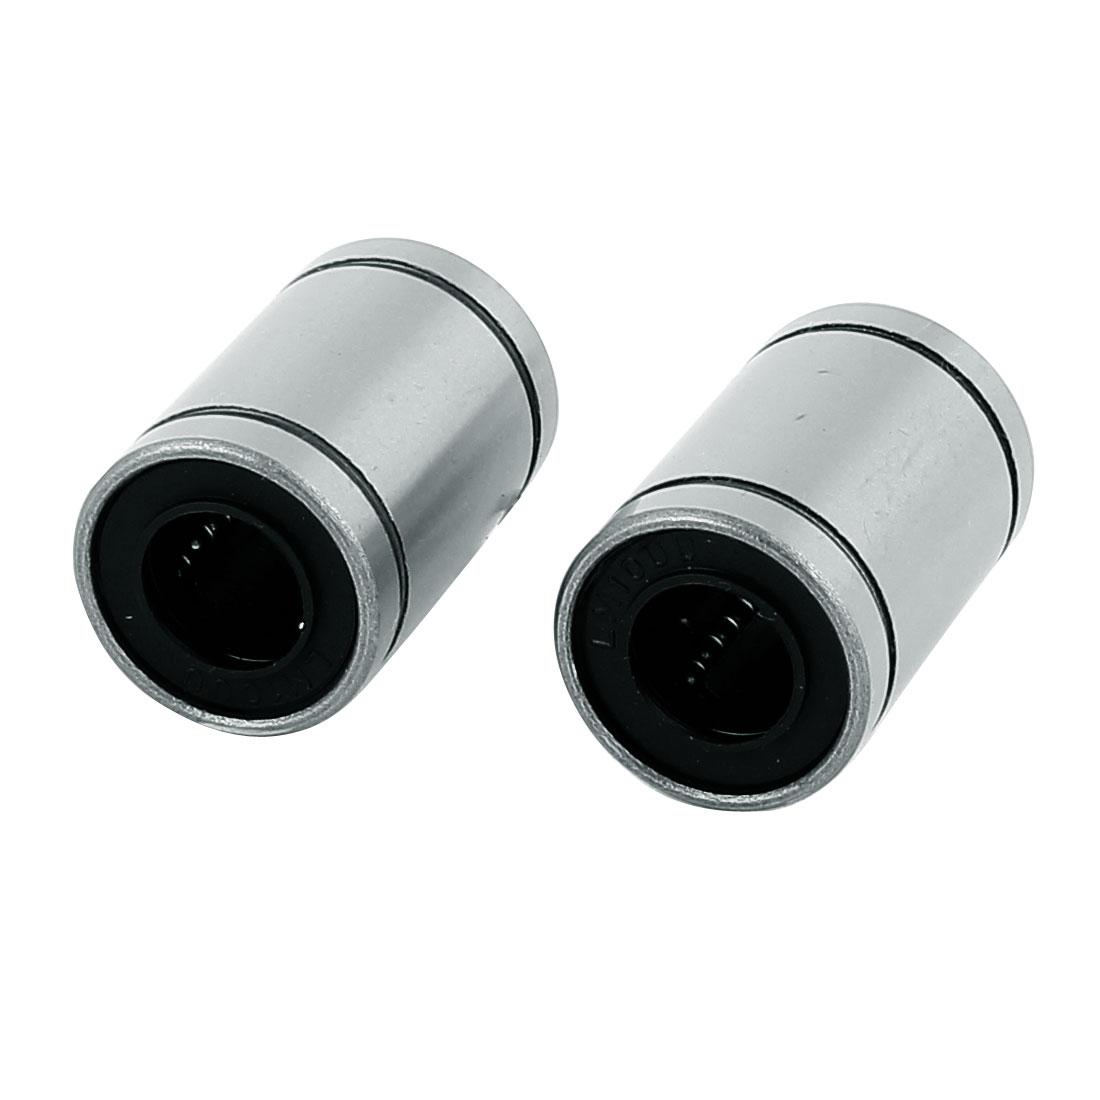 2 Pcs LM10UU 10mm x 19mm x 29mm Silver Tone Carbon Steel Linear Motion Ball Bearing